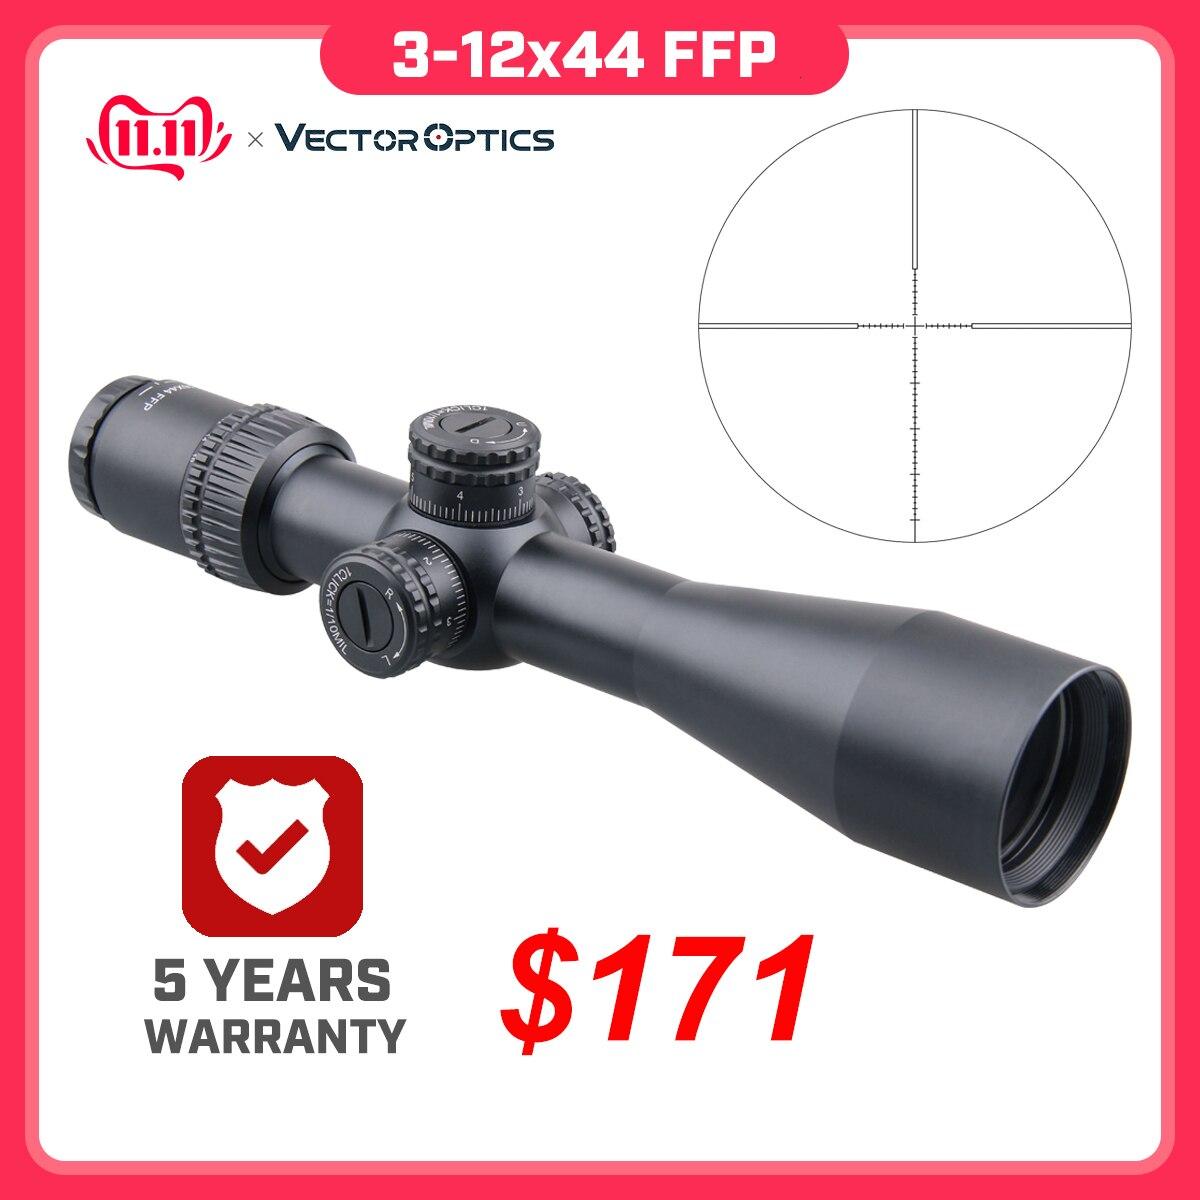 Vector Optics Veyron FFP 3-12x44 Ultra Compact Air Gun Riflescope Scope First Focal Plane .223 7.62 AR15 Air Rifle 1/10 MIL